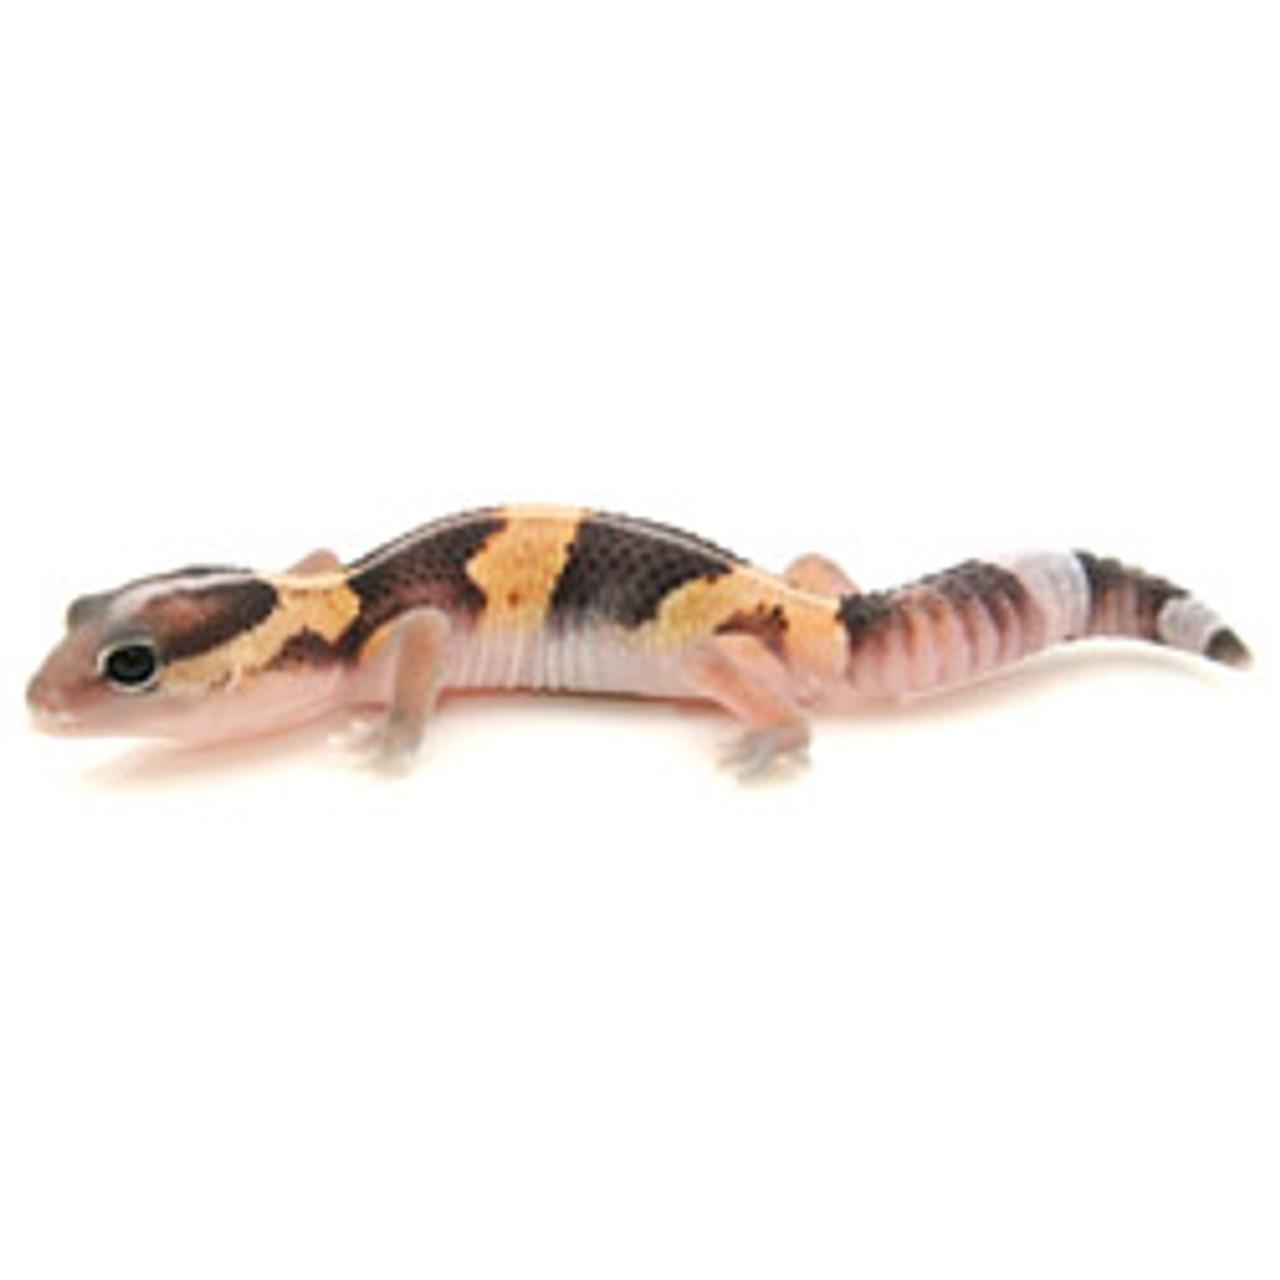 African Fat Tail Gecko  (Hemitheconyx caudicinctus) Striped Baby